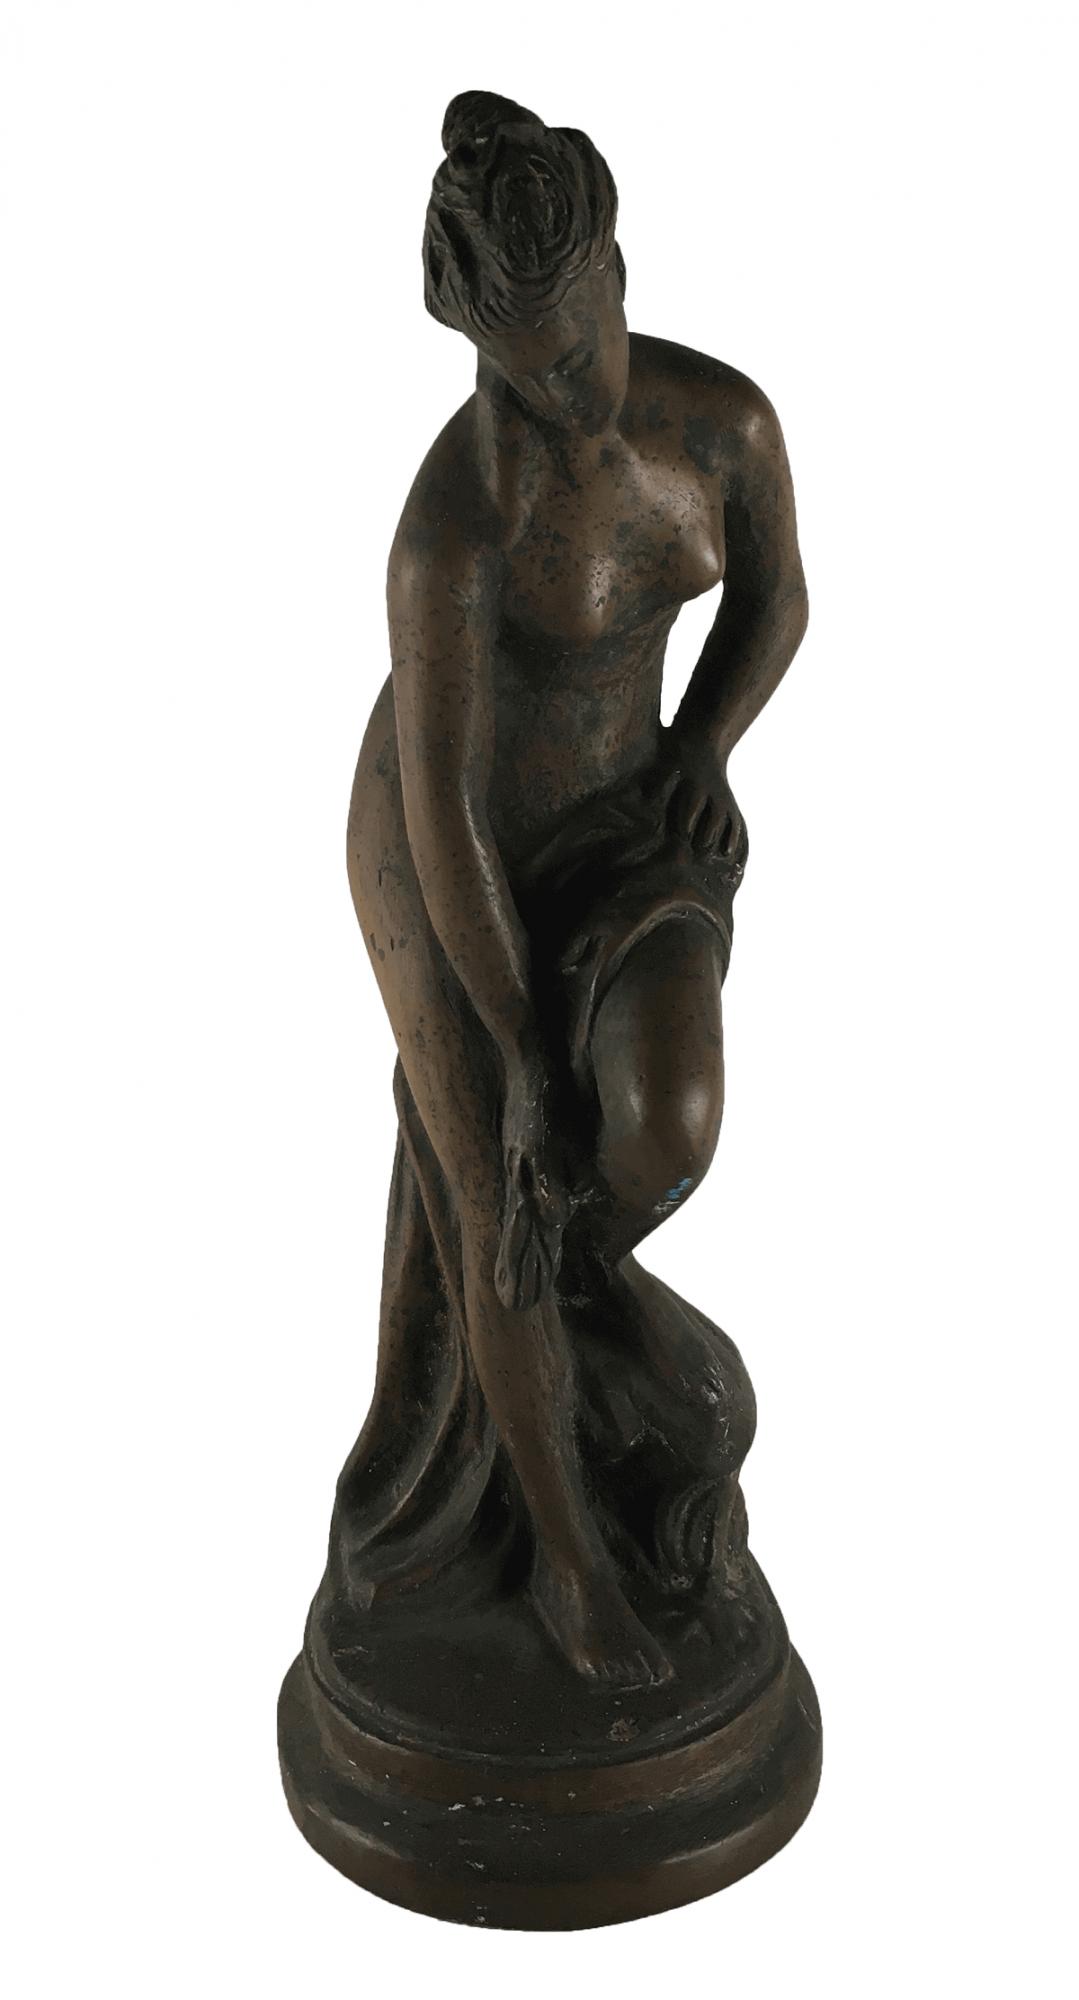 Escultura Antiga De Bronze Maciço Nu Feminino 6kg